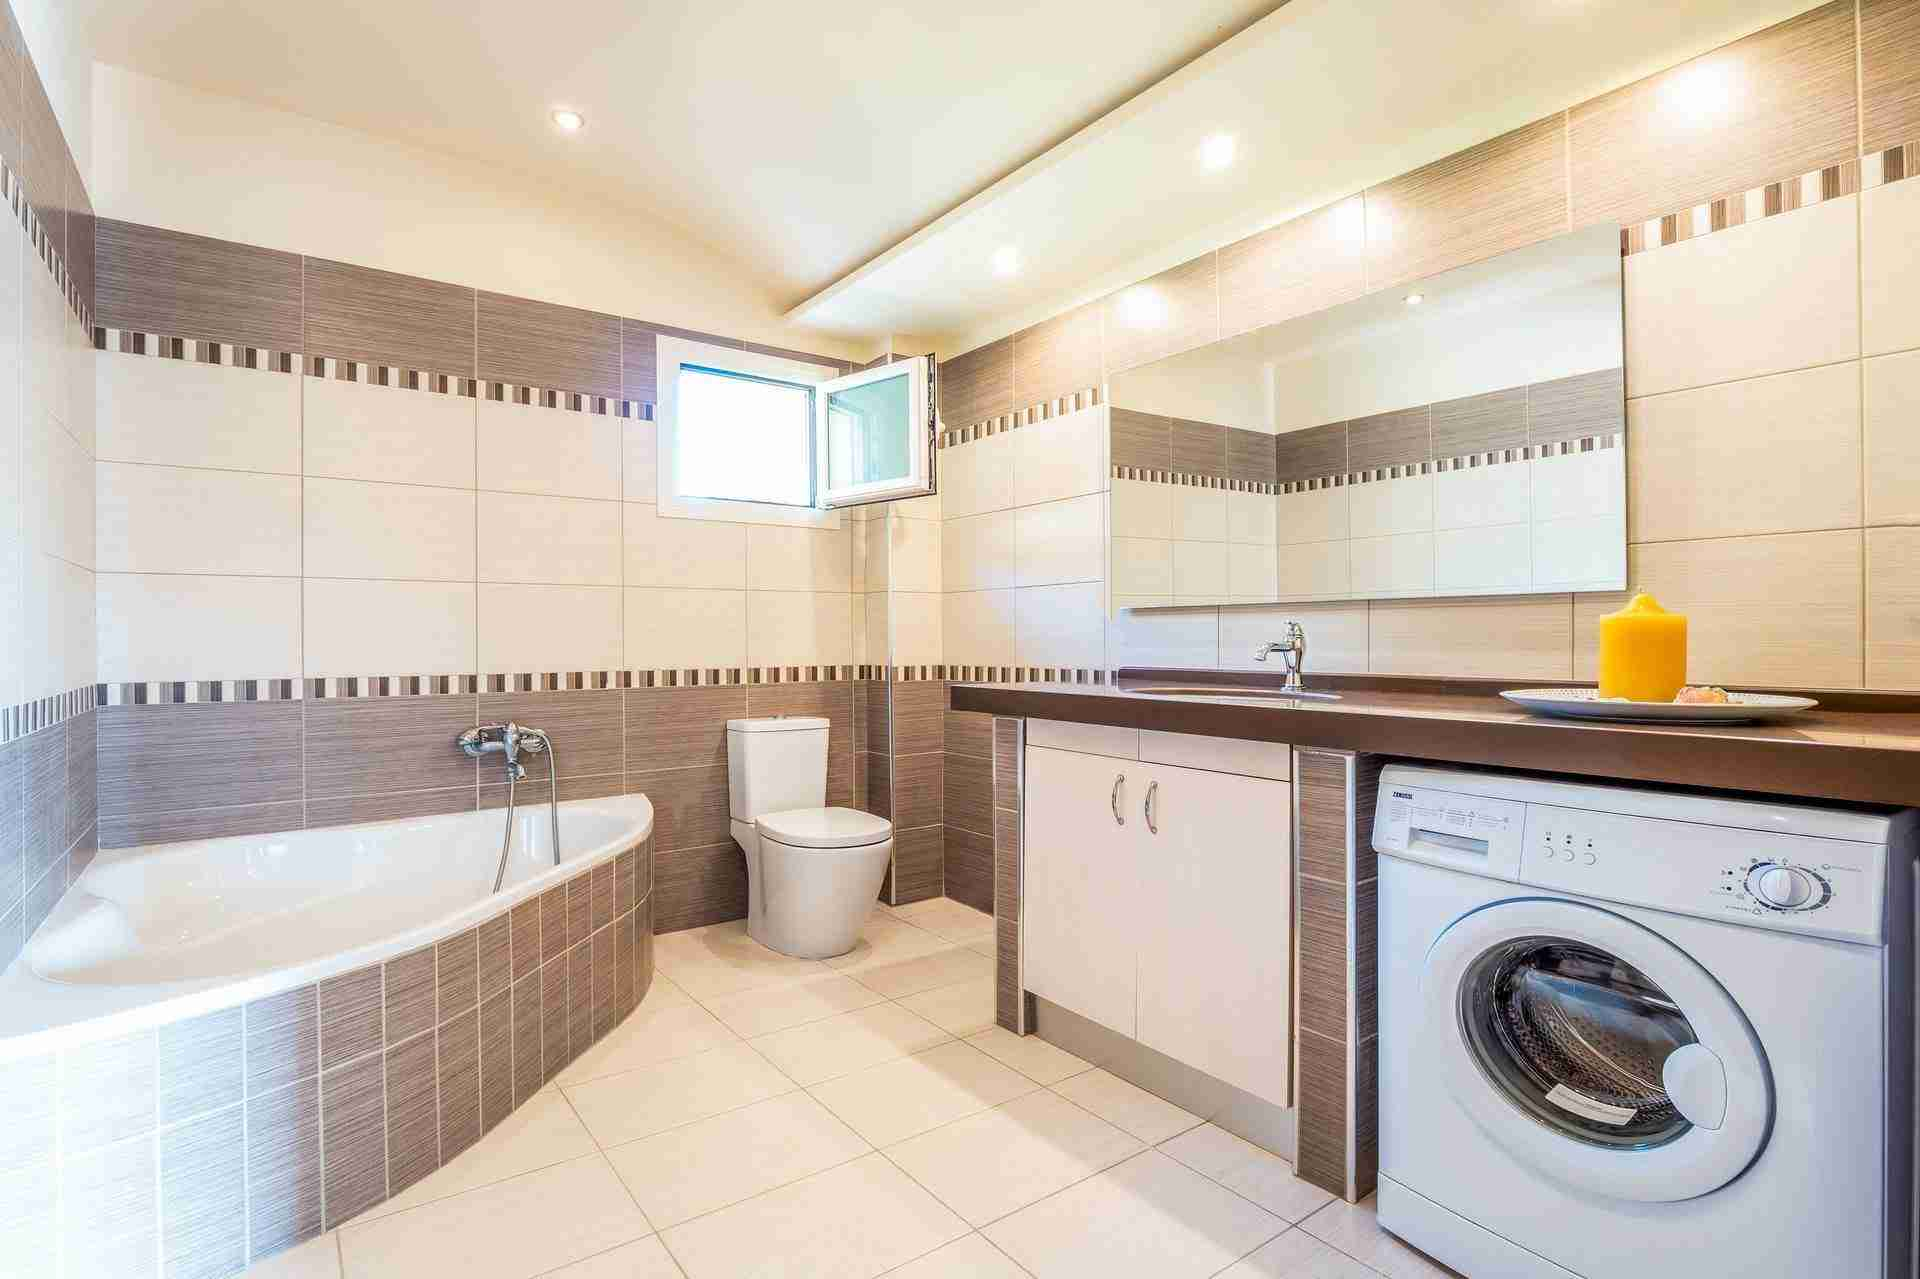 14 Petra bathroom